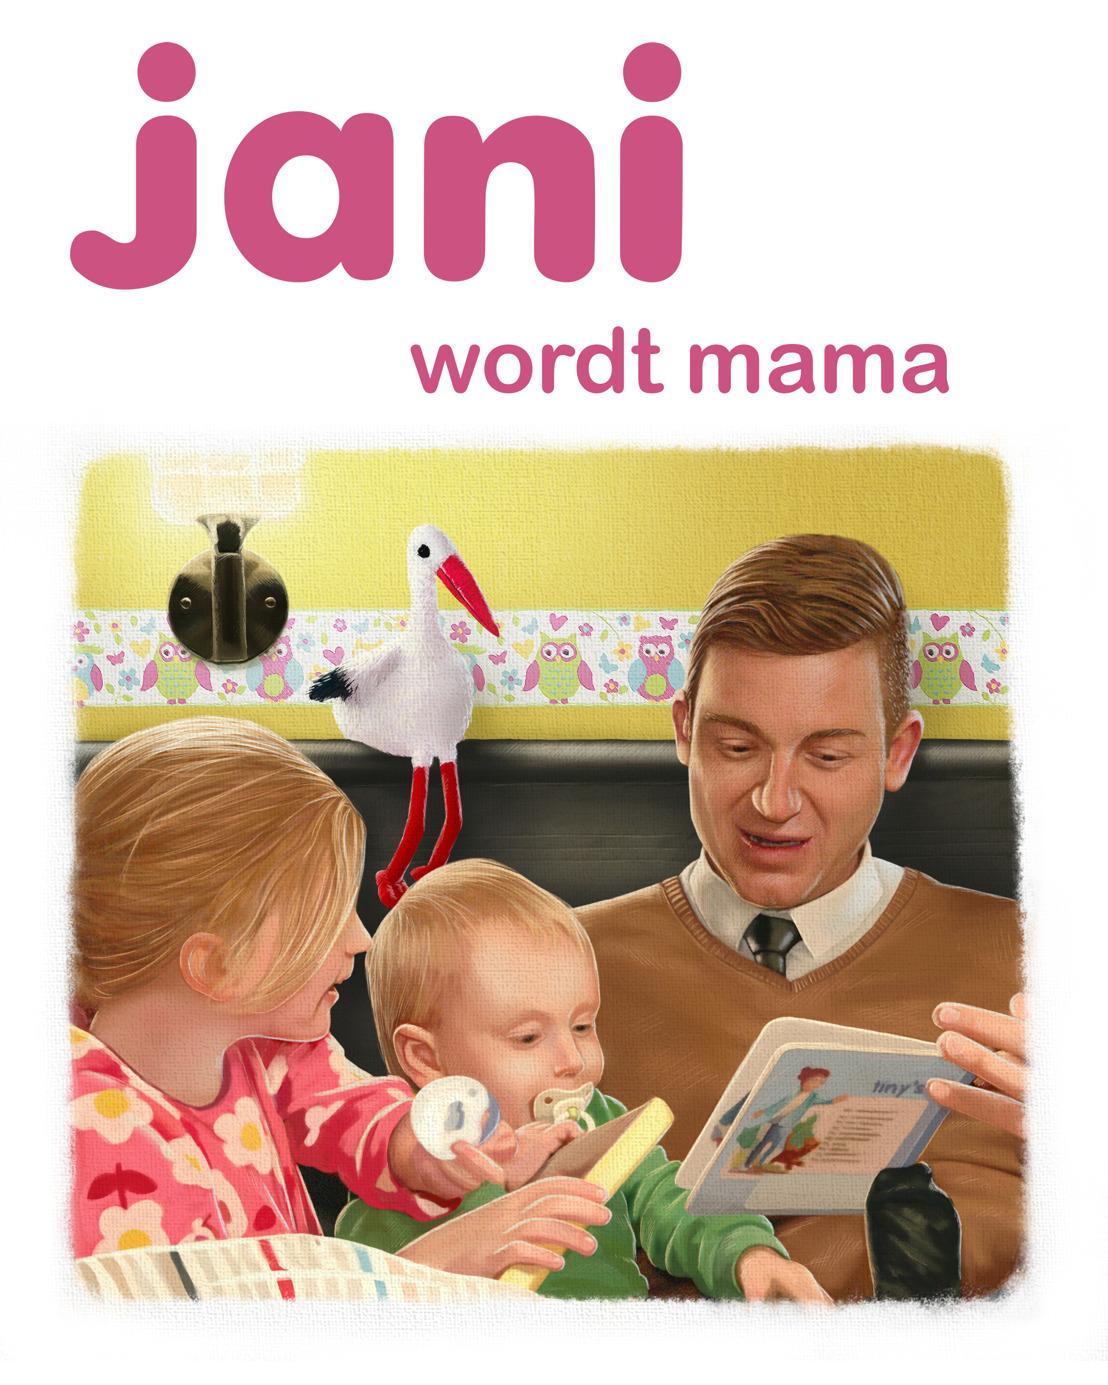 Jani wordt maandag mama